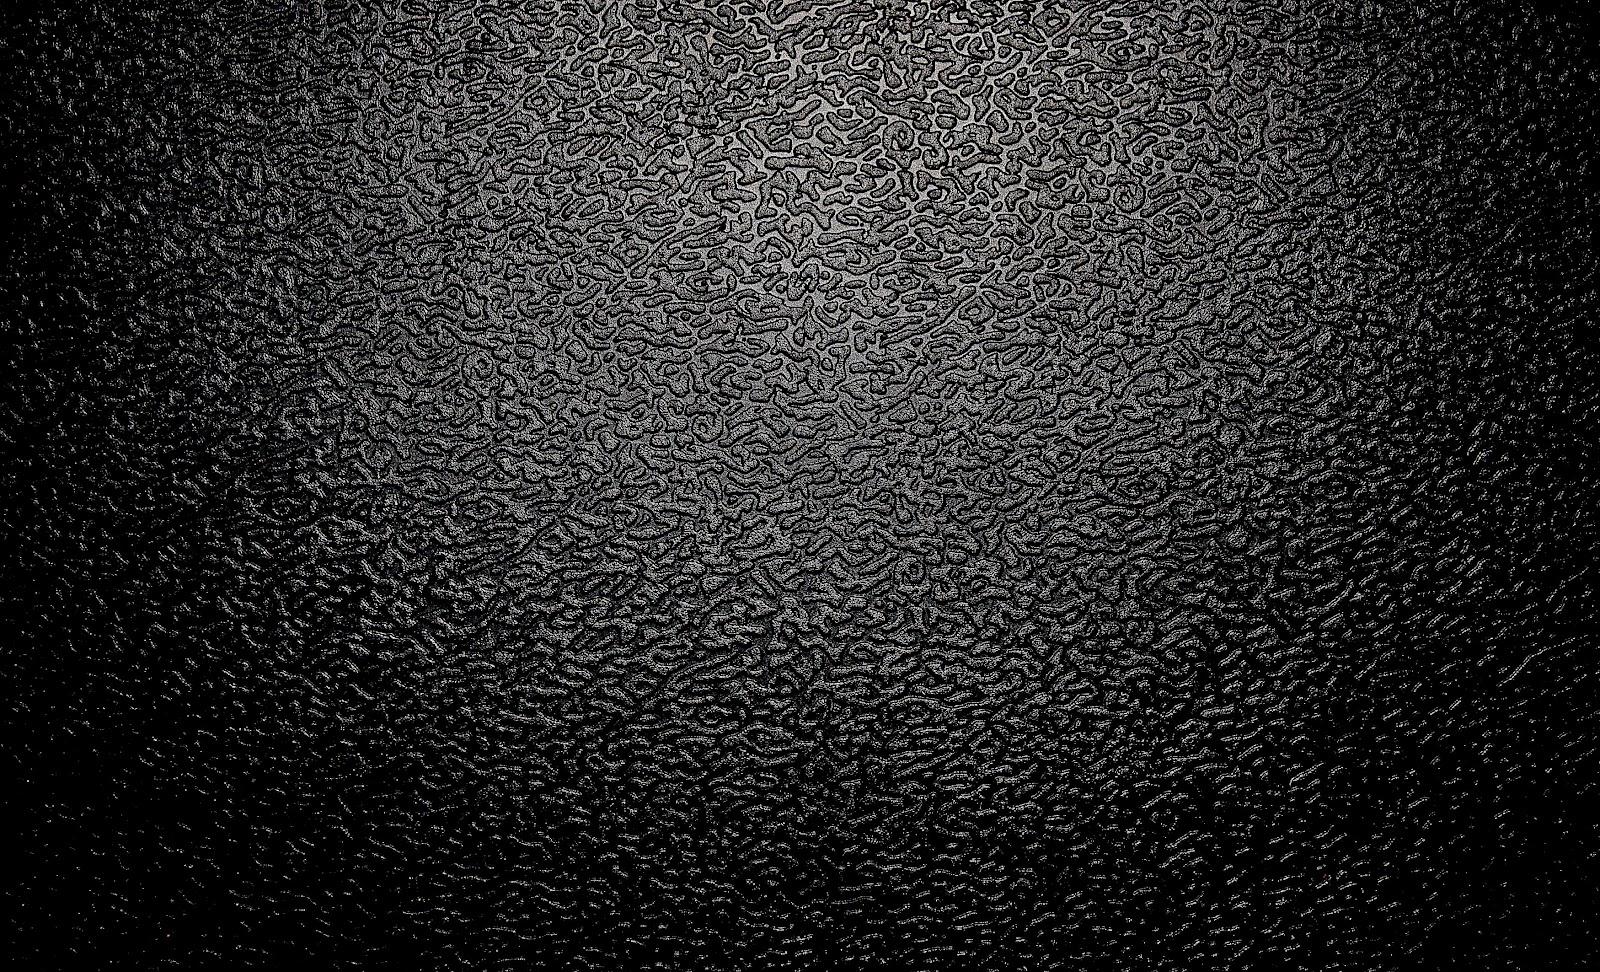 Faux Brick Wallpaper 3d Black Textured Wallpaper Cool Hd Wallpapers